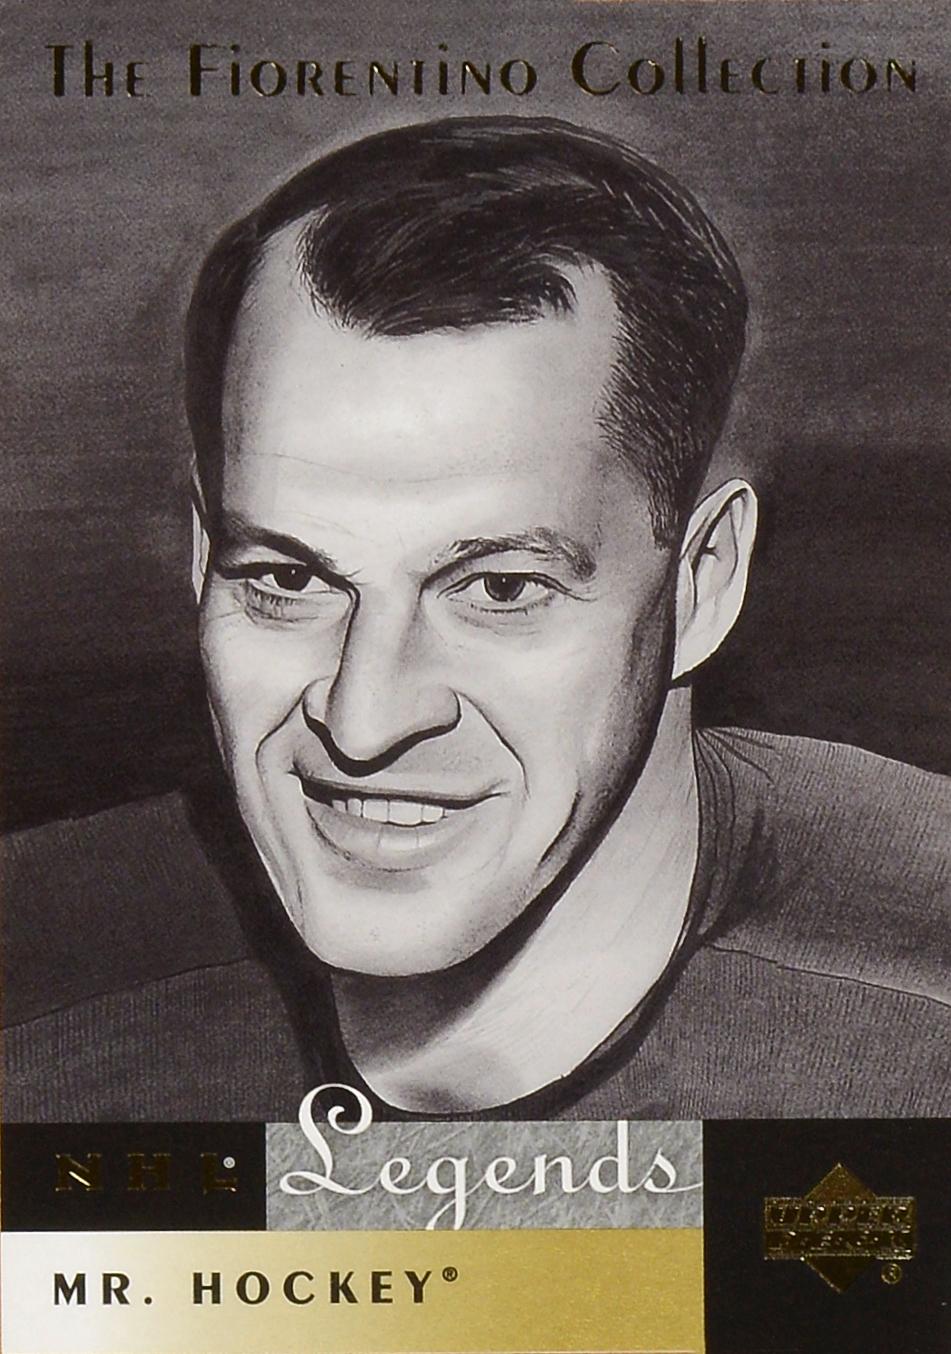 Hockey_Mr.jpg